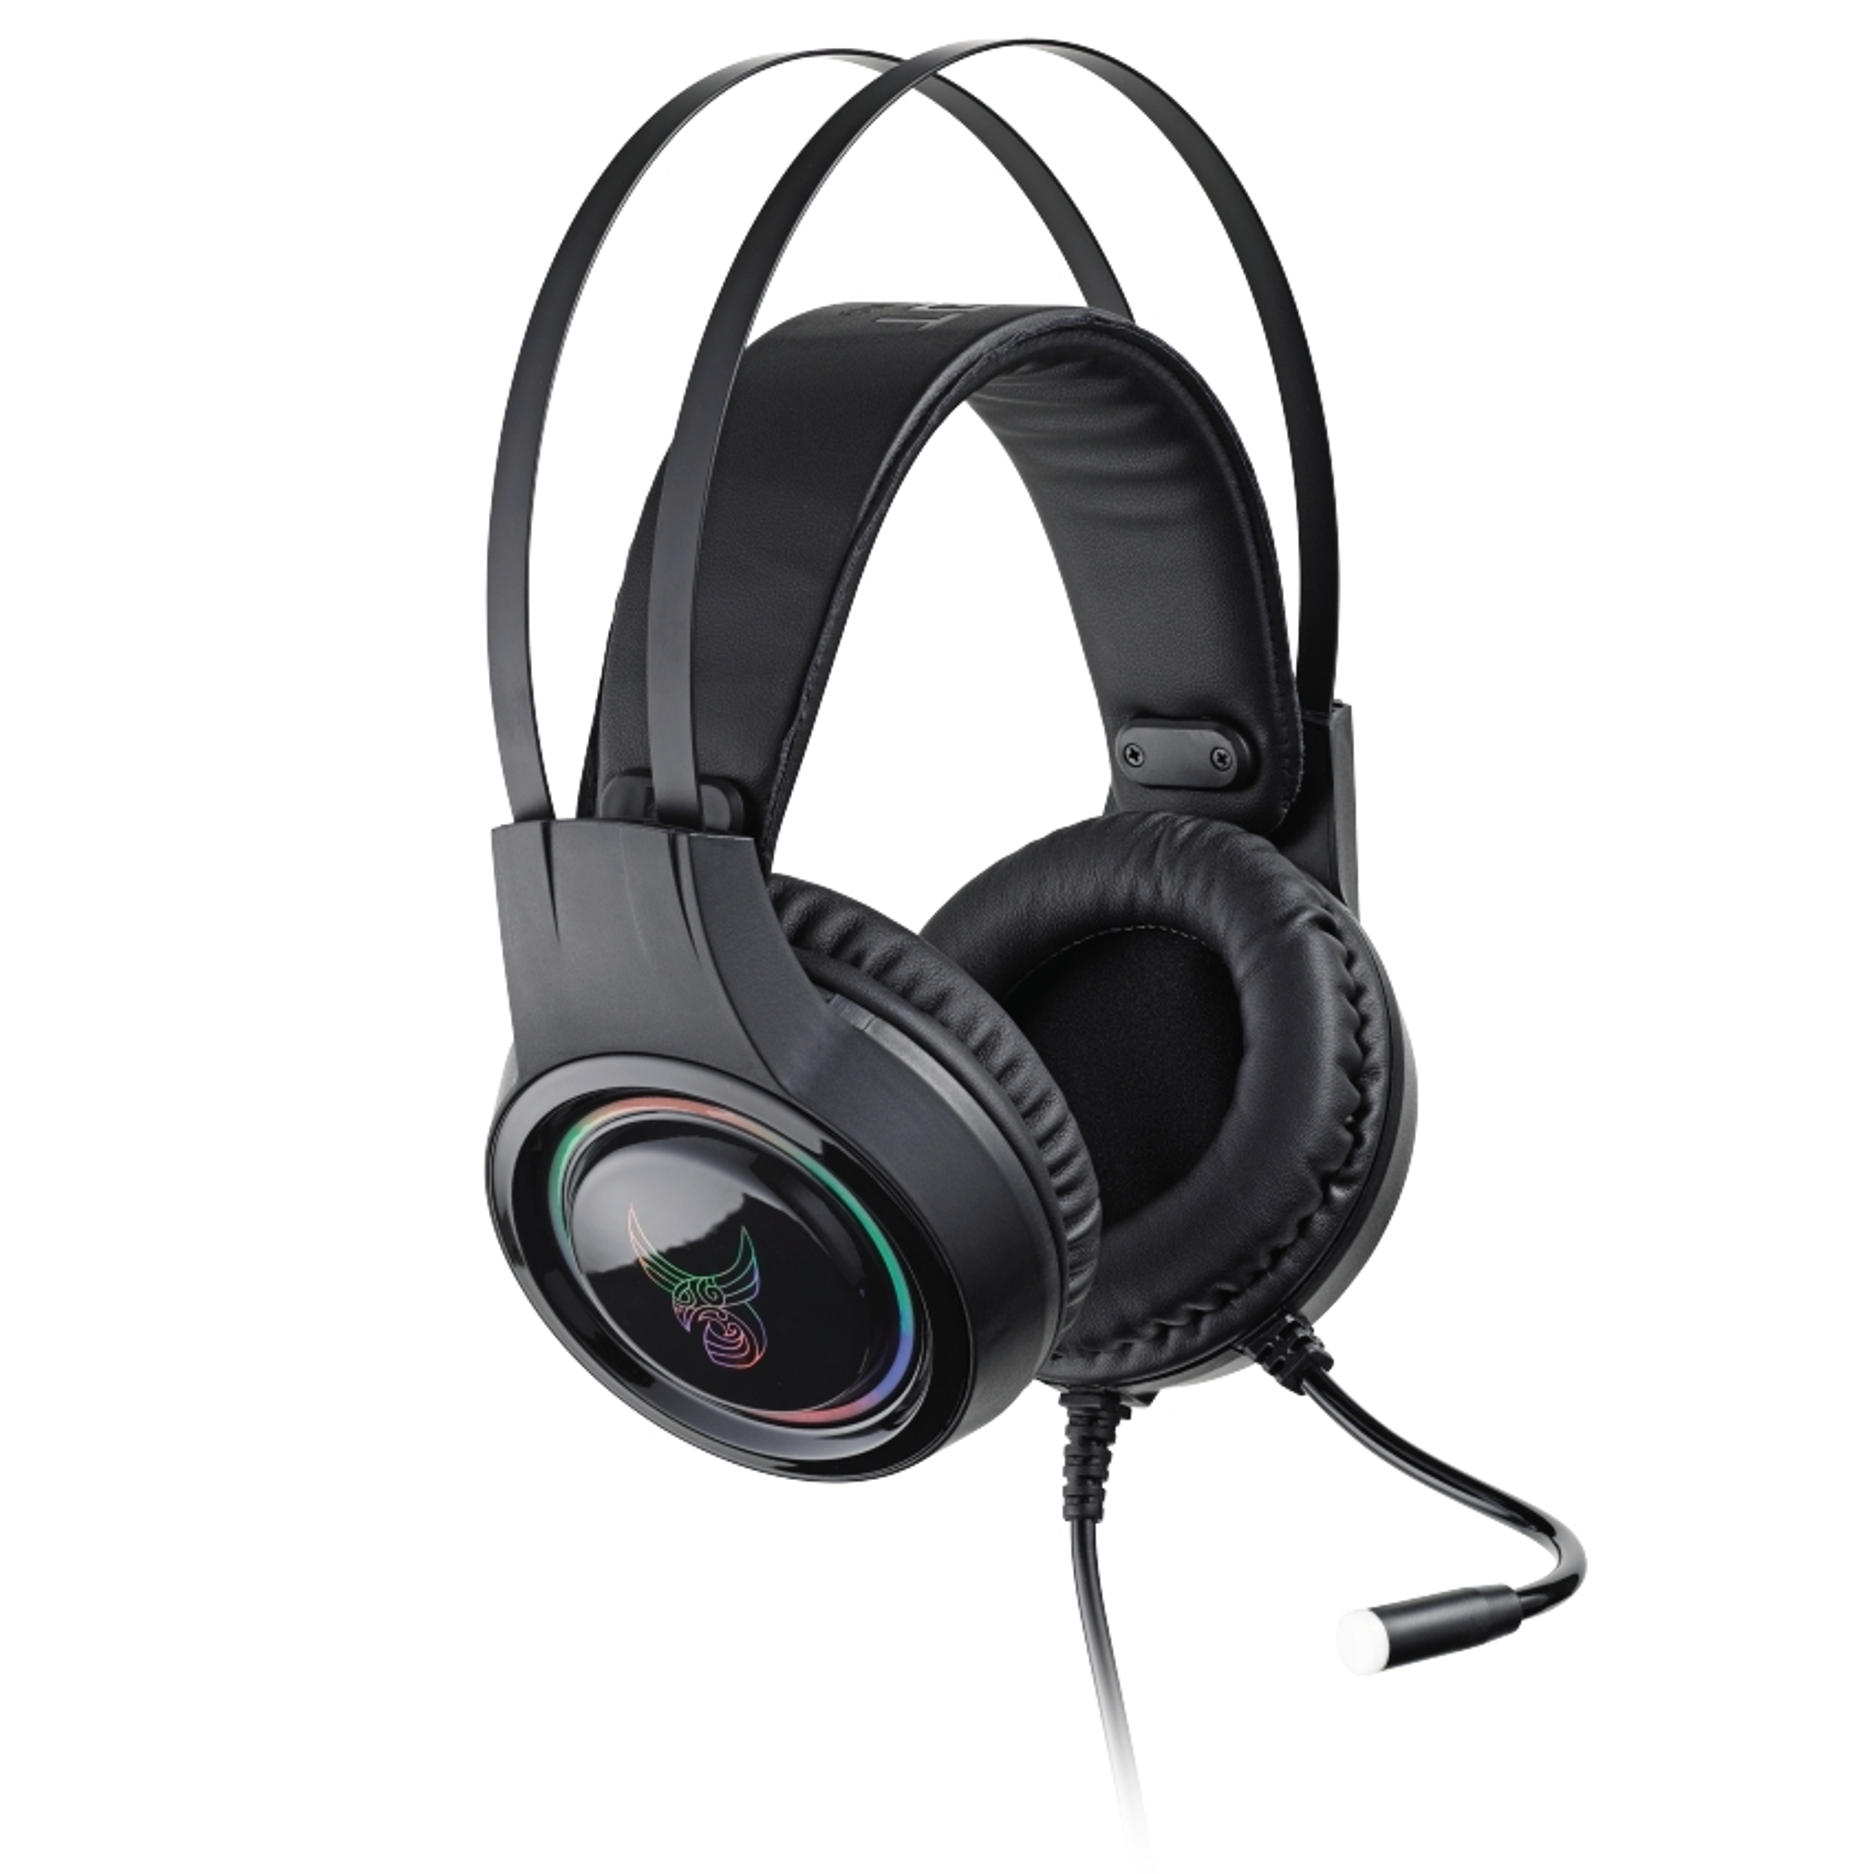 L33T GJALLARHORN Gaming-Headset mit Mikrofon und RGB-Beleuchtung